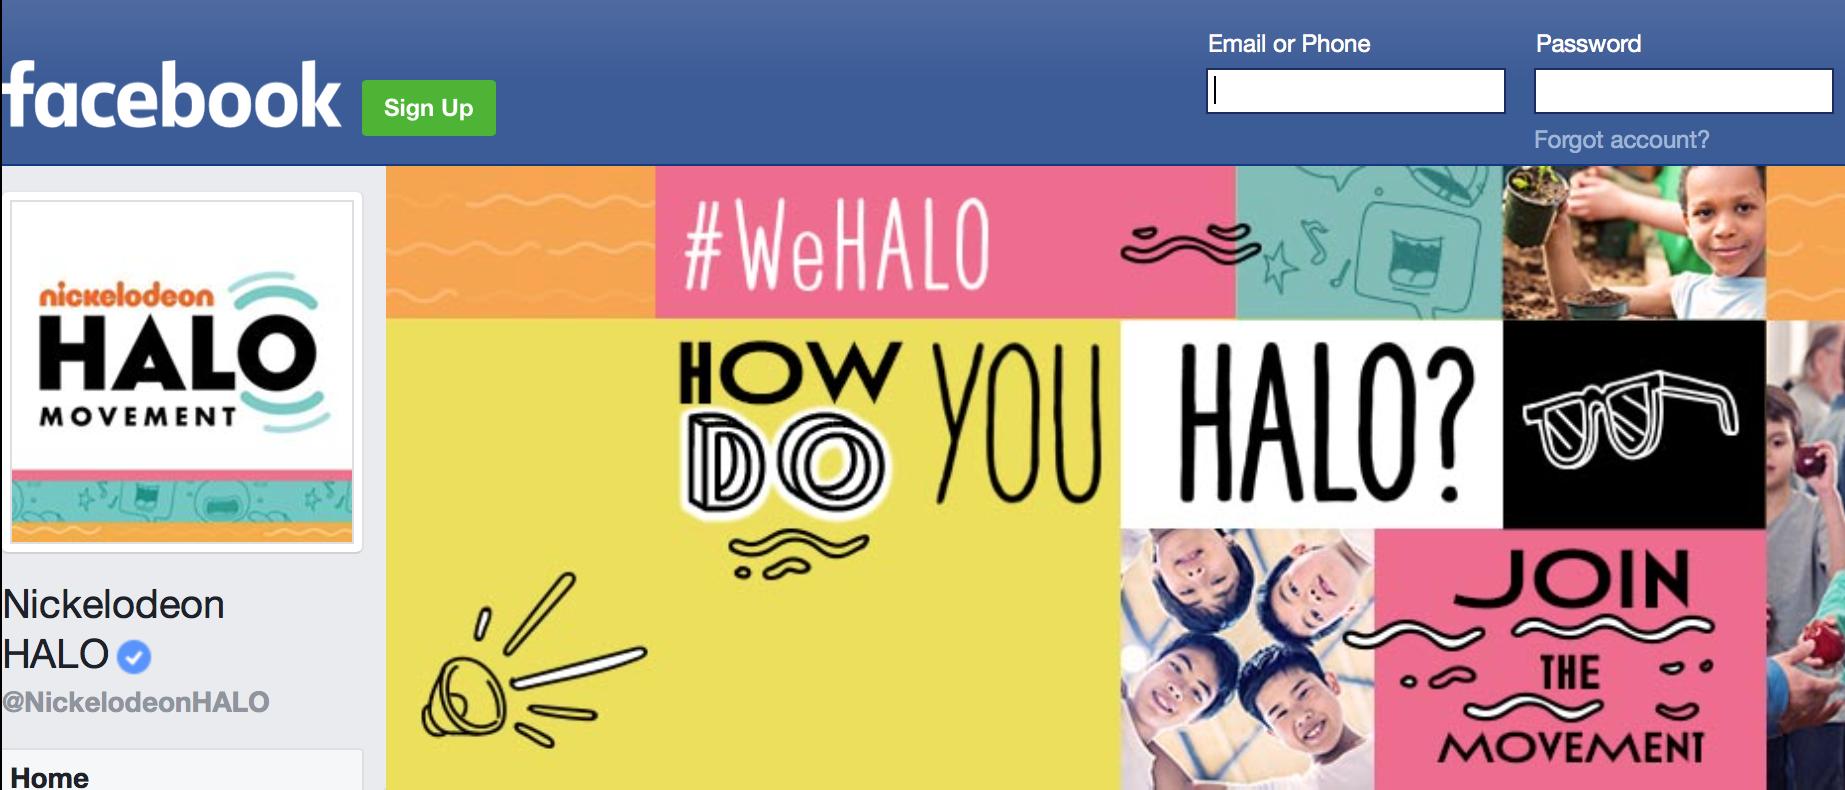 Social media screen shot of Nickelodeon facebook page